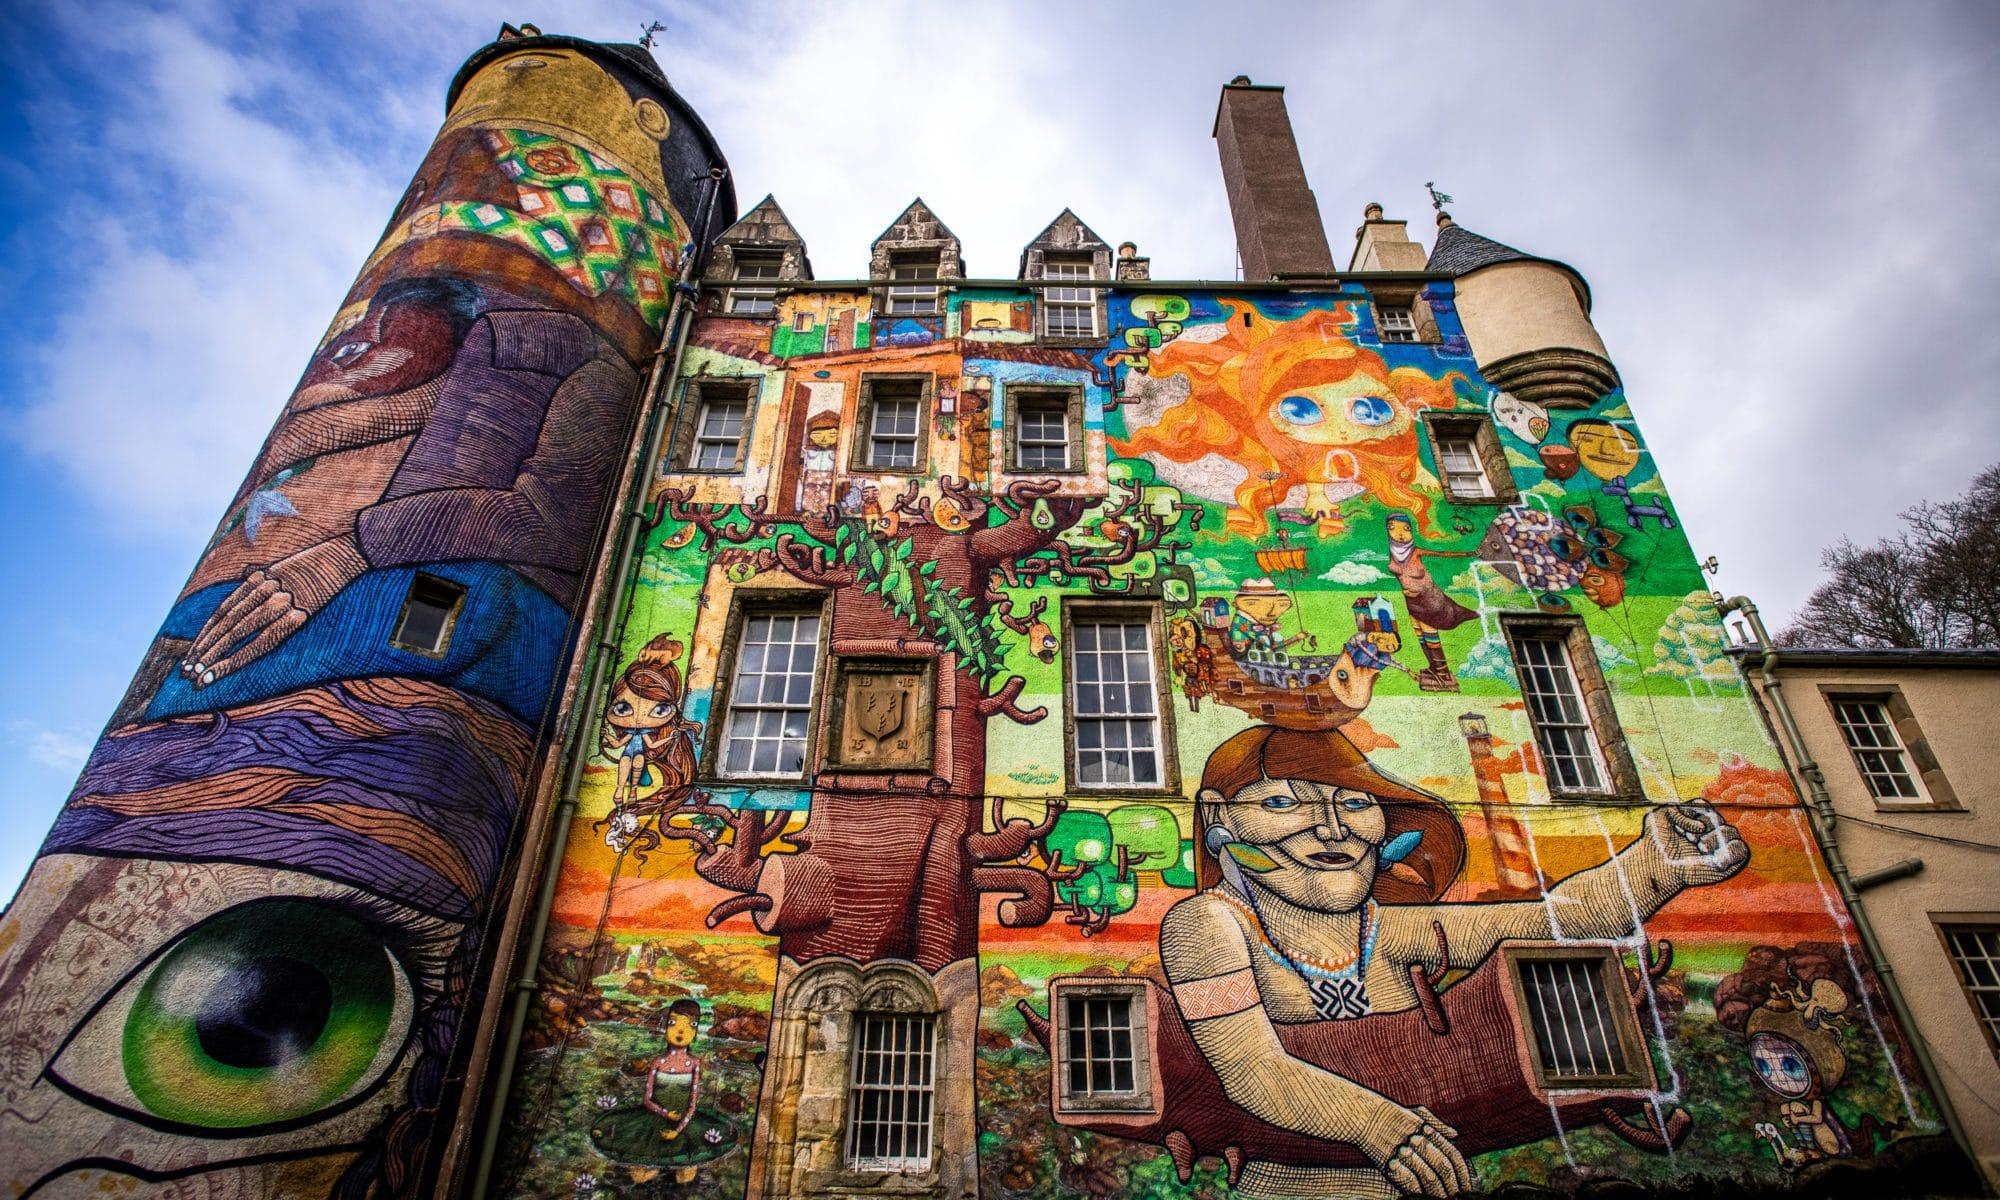 kelburn-castle-the-graffiti-castle-sir-edwards-roastrip